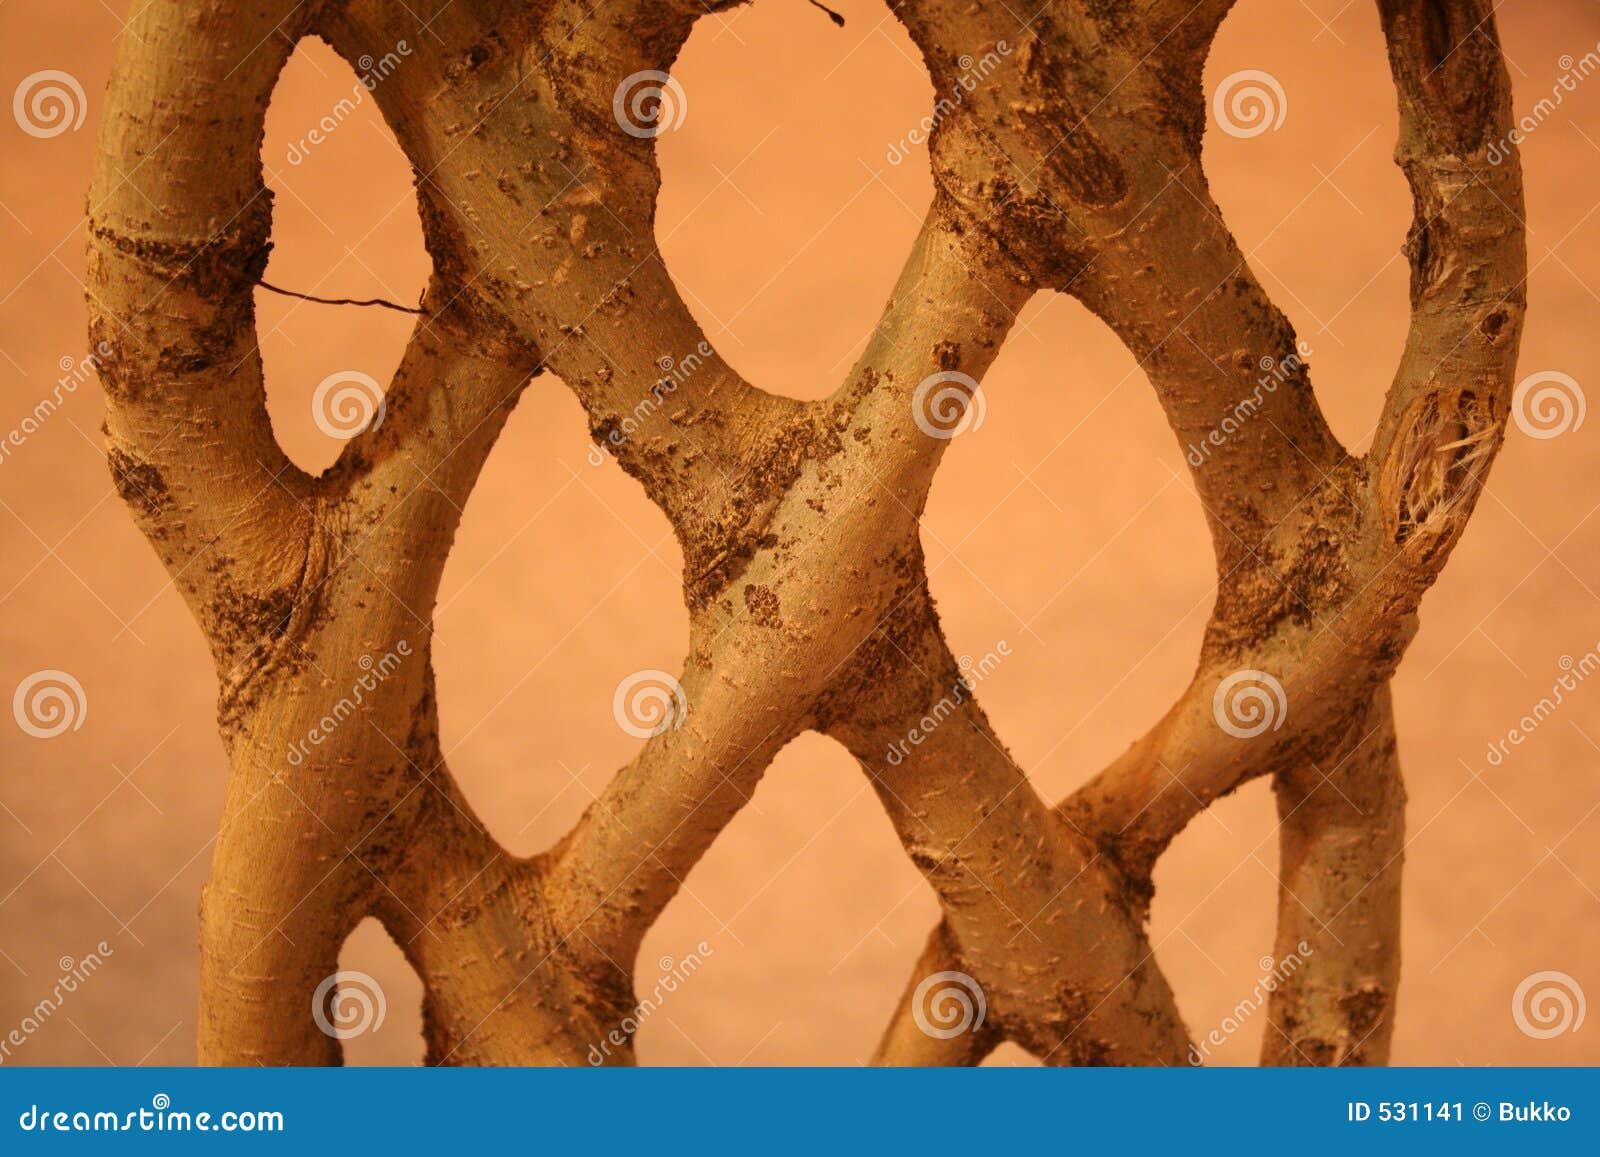 Download 神秘的工厂 库存图片. 图片 包括有 庭院, 装饰, 少见, 木头, 种植, browne, 树木繁茂, 工厂 - 531141